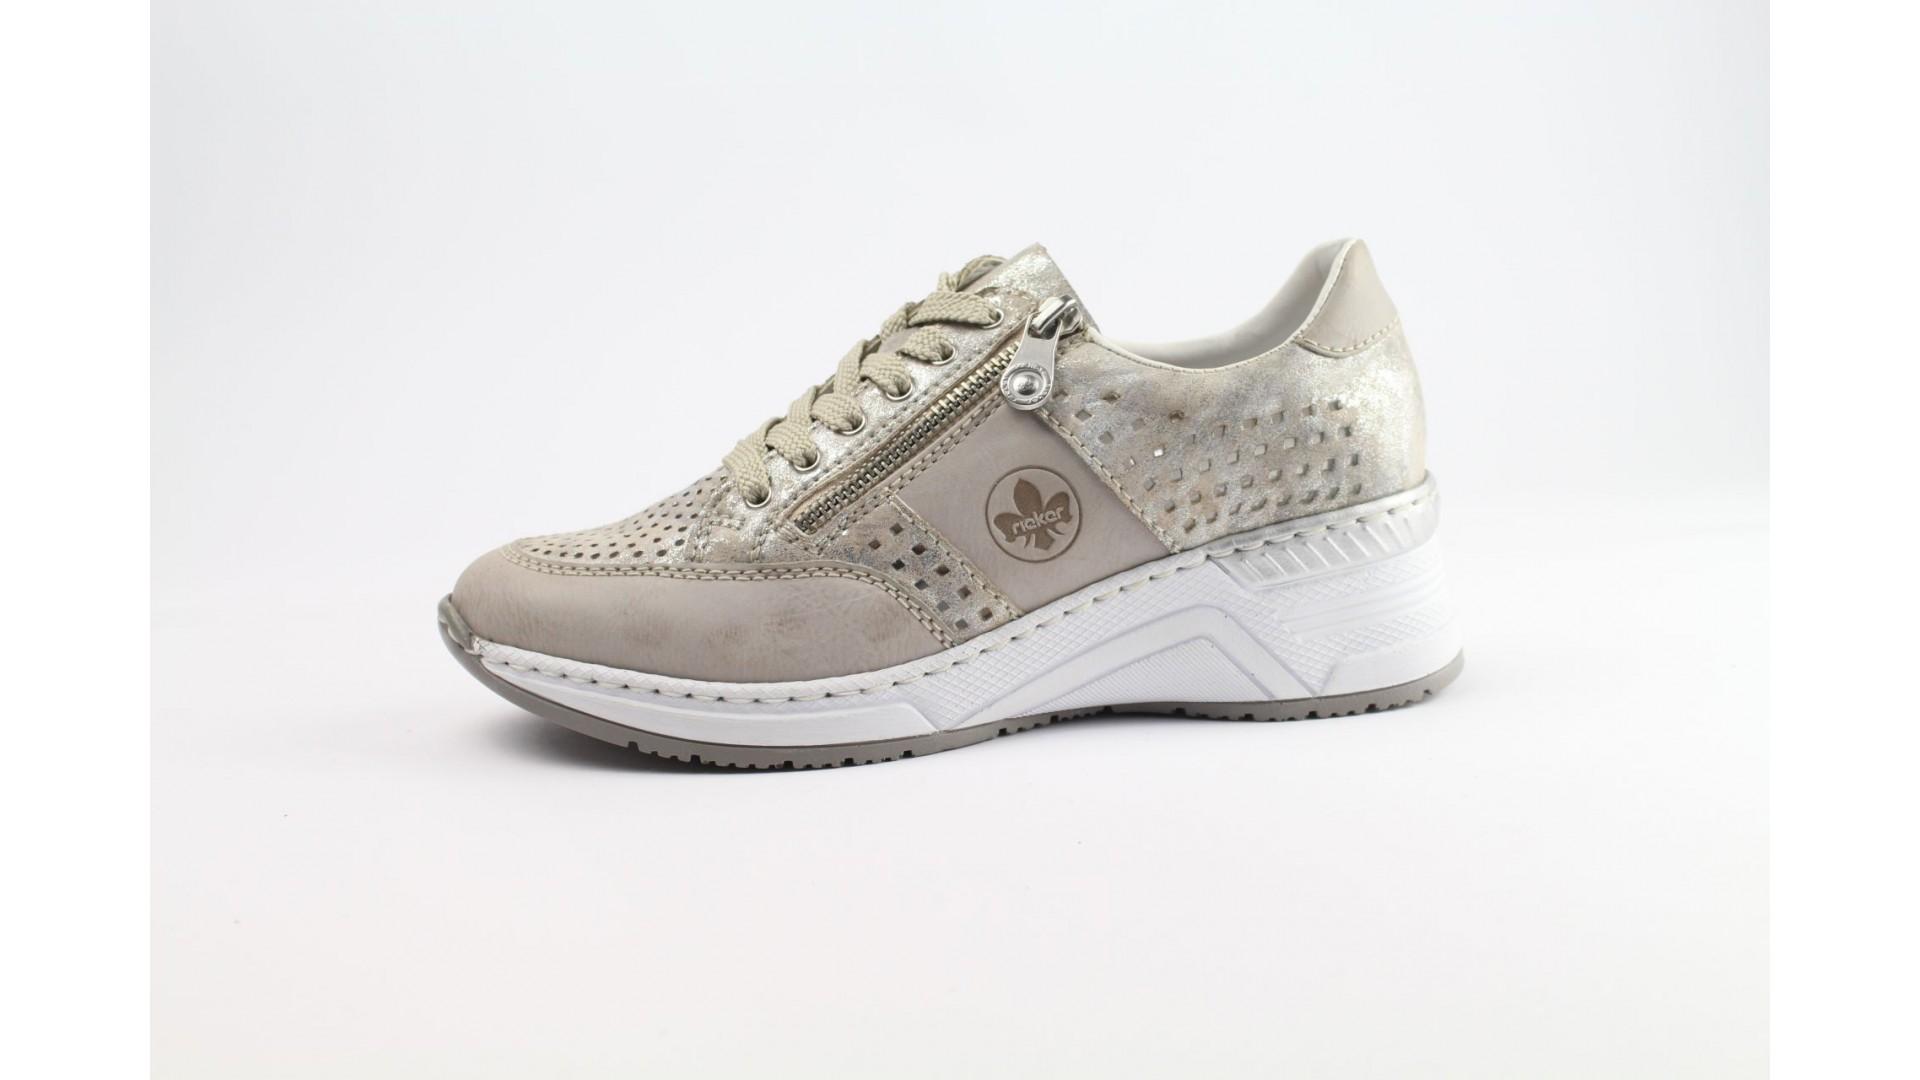 RIEKER bézs női sneaker cipő